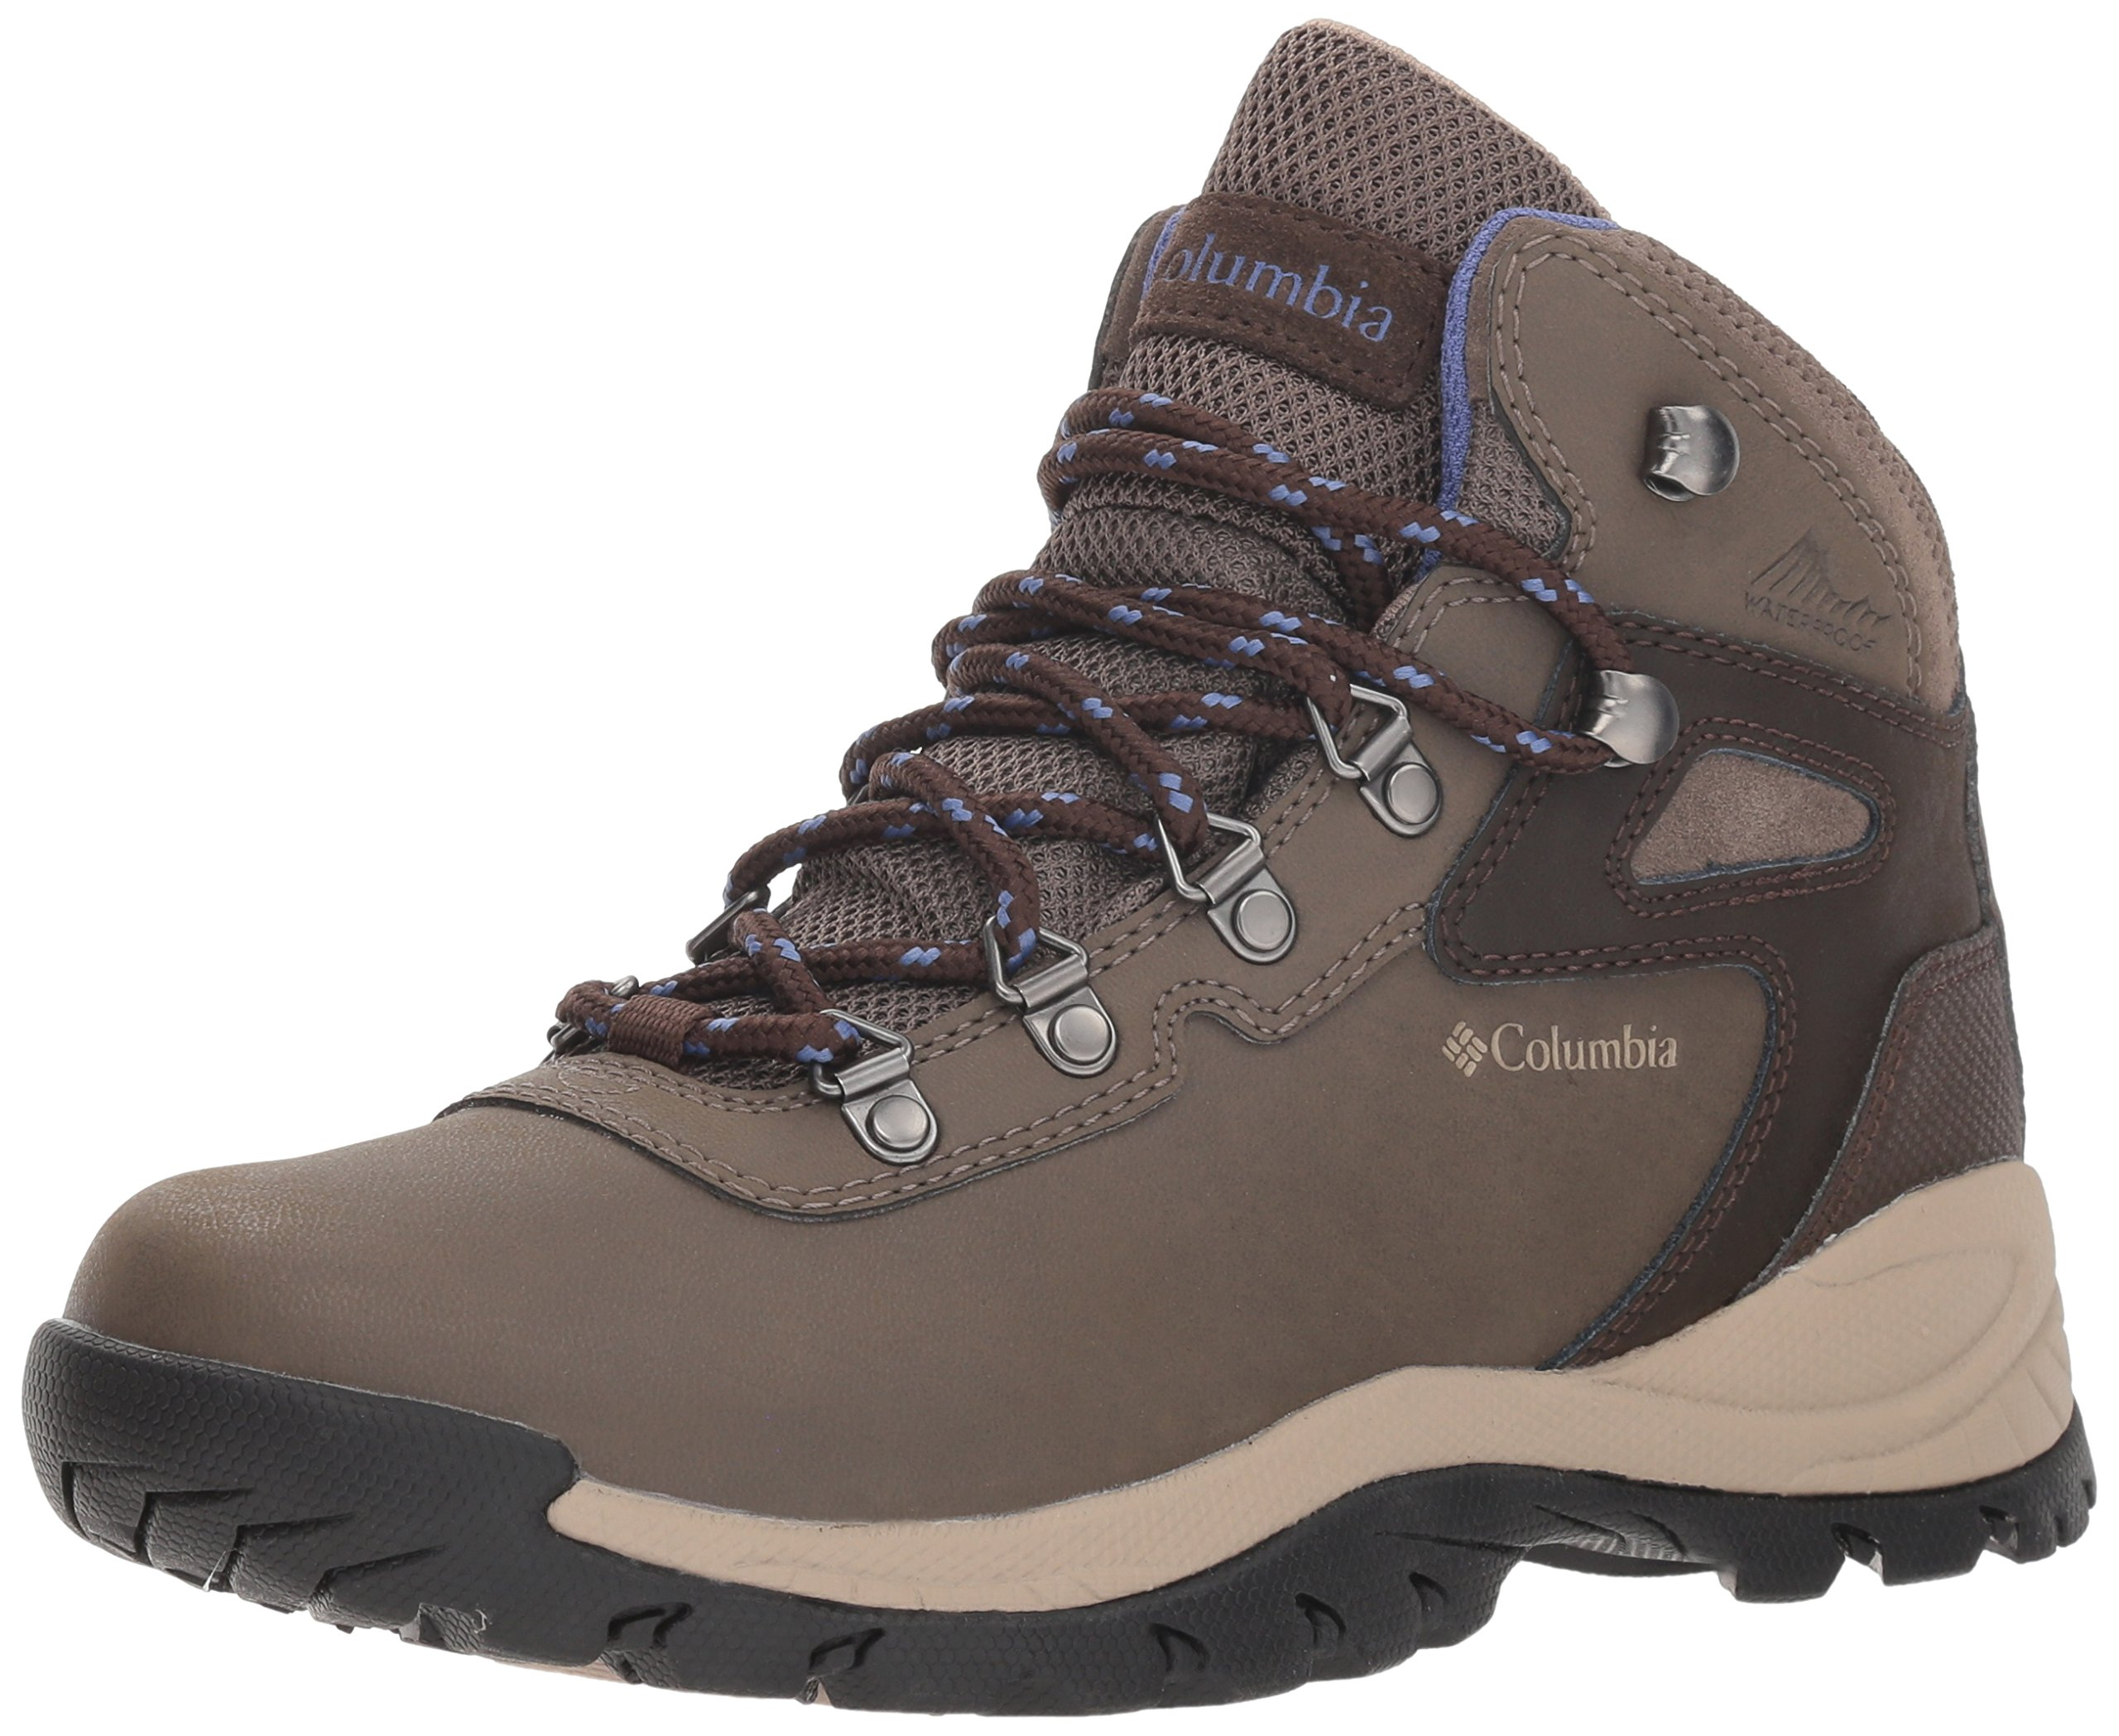 Columbia Women's Newton Ridge Plus Hiking Shoe, Mud, Eve, 6.5 Regular US